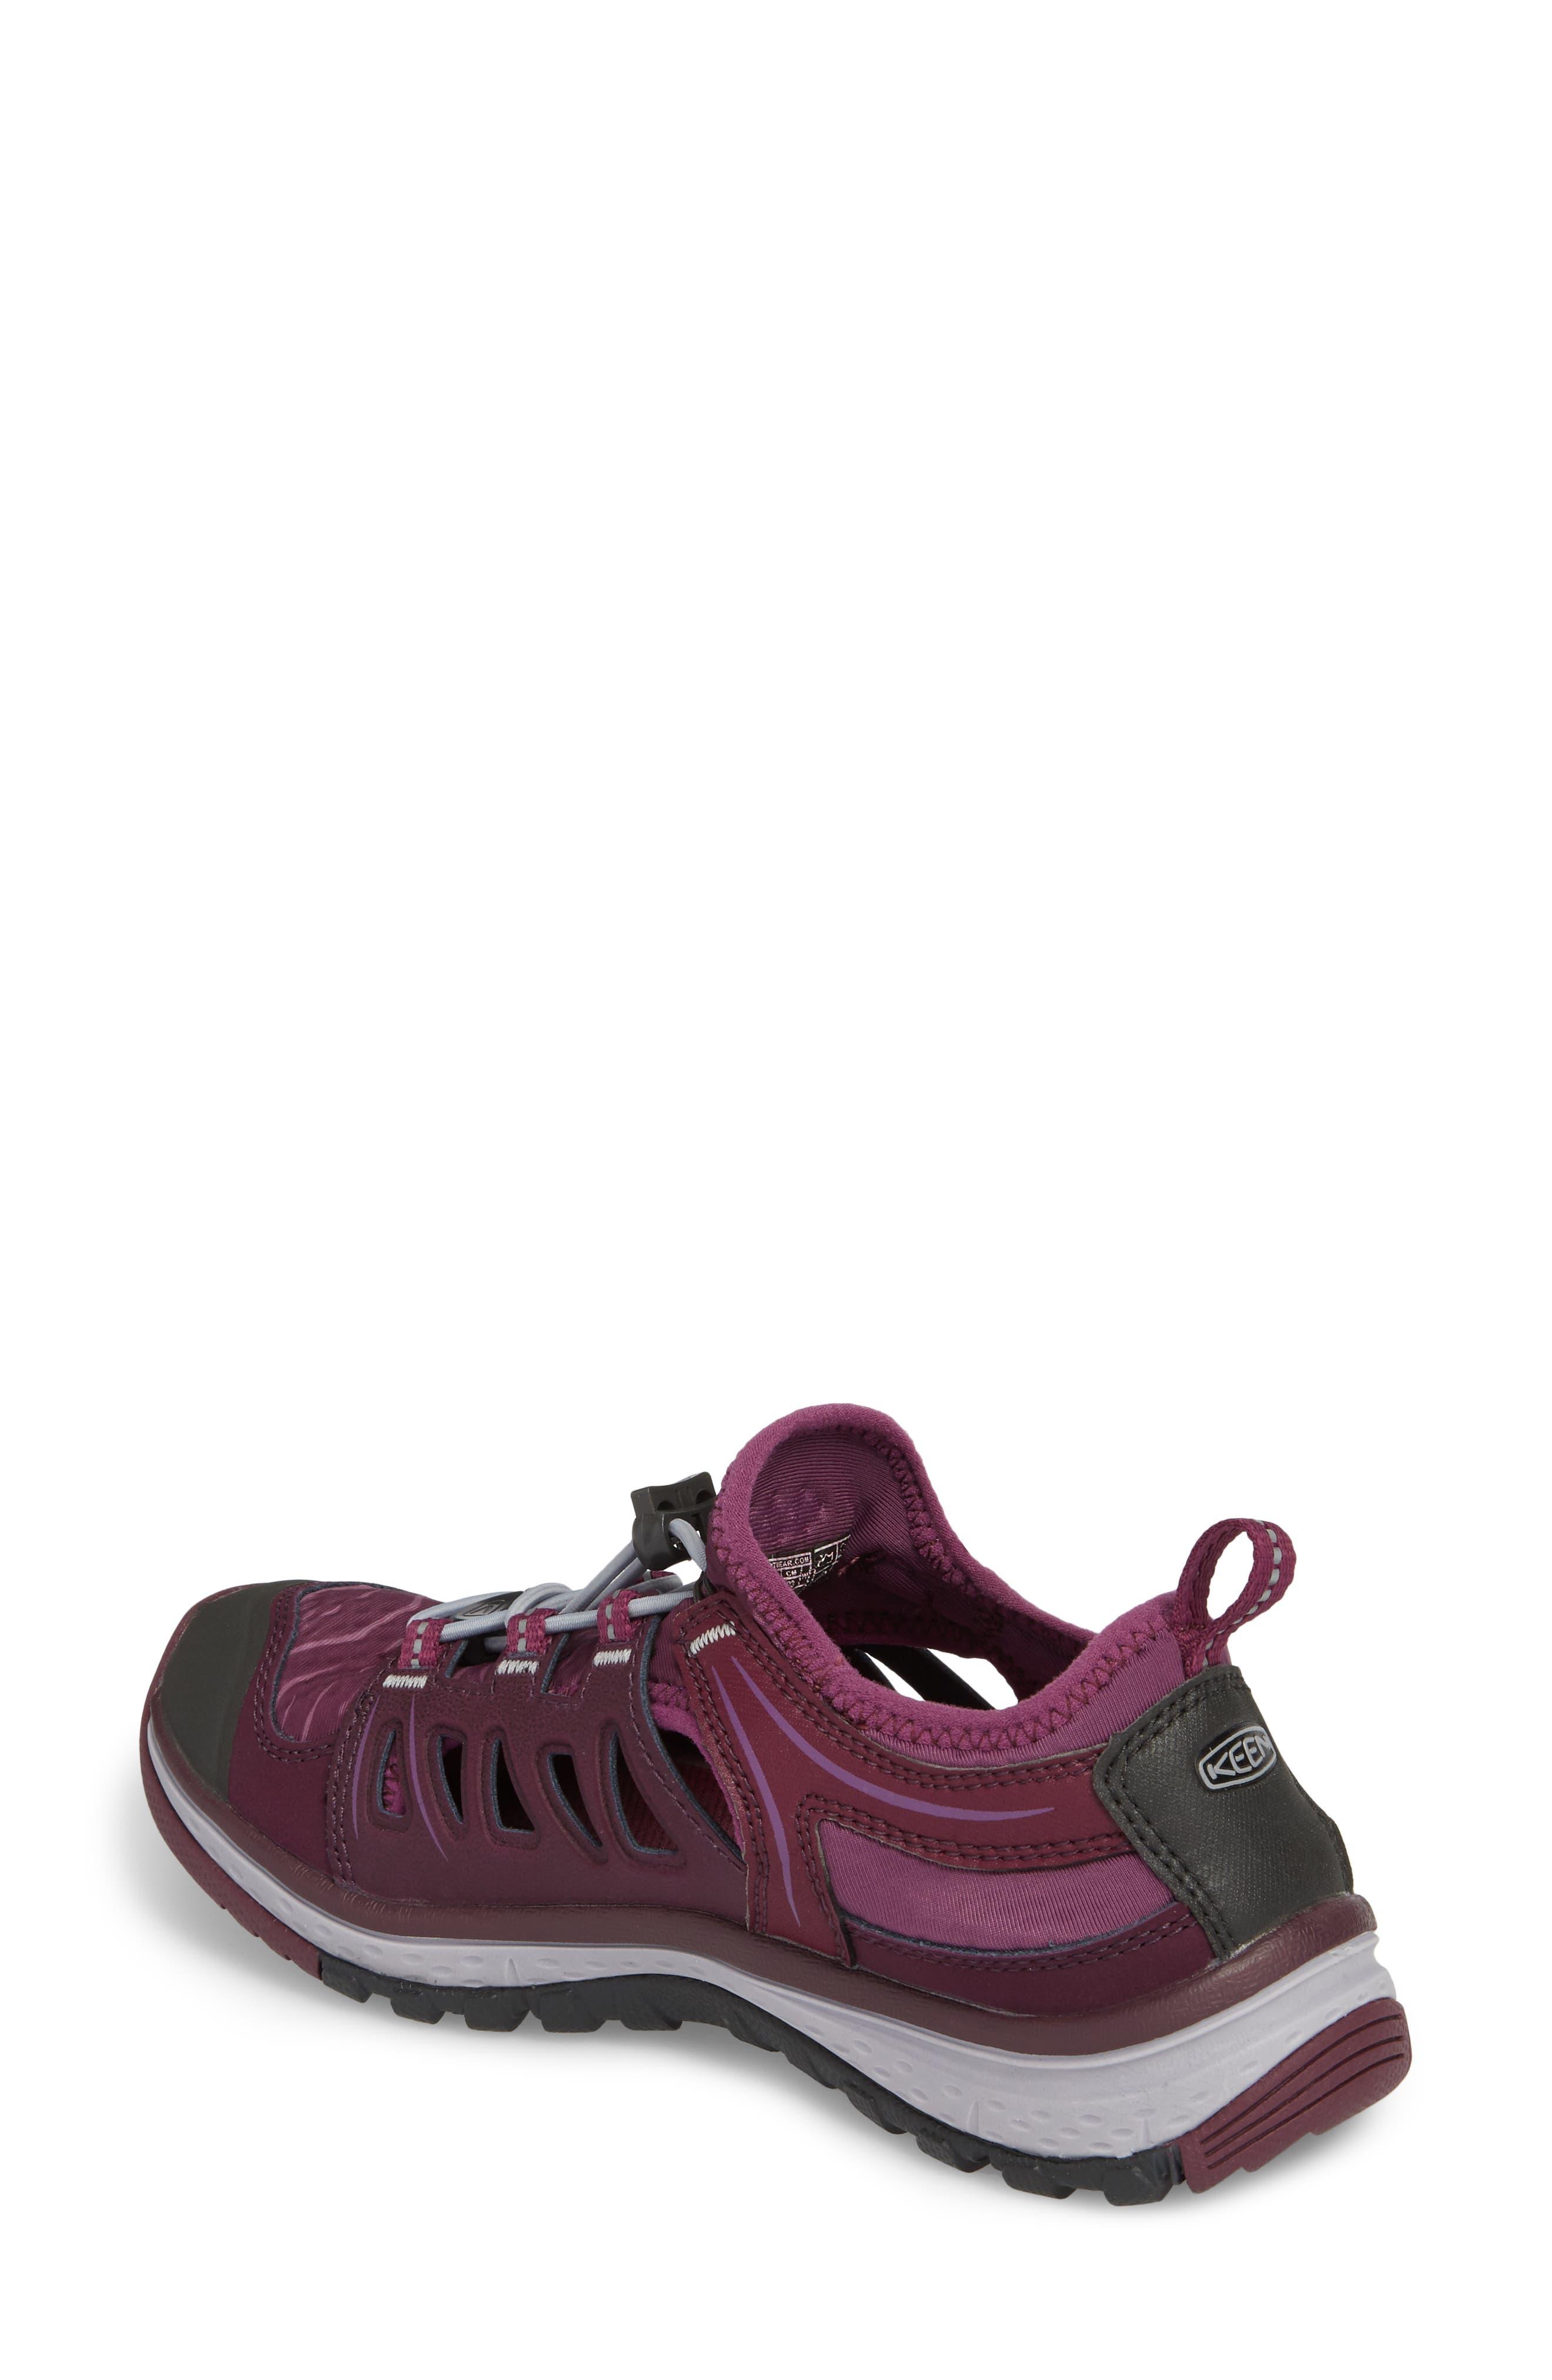 Terradora Ethos Hiking Sneaker,                             Alternate thumbnail 2, color,                             Grape Wine/ Grape Kiss